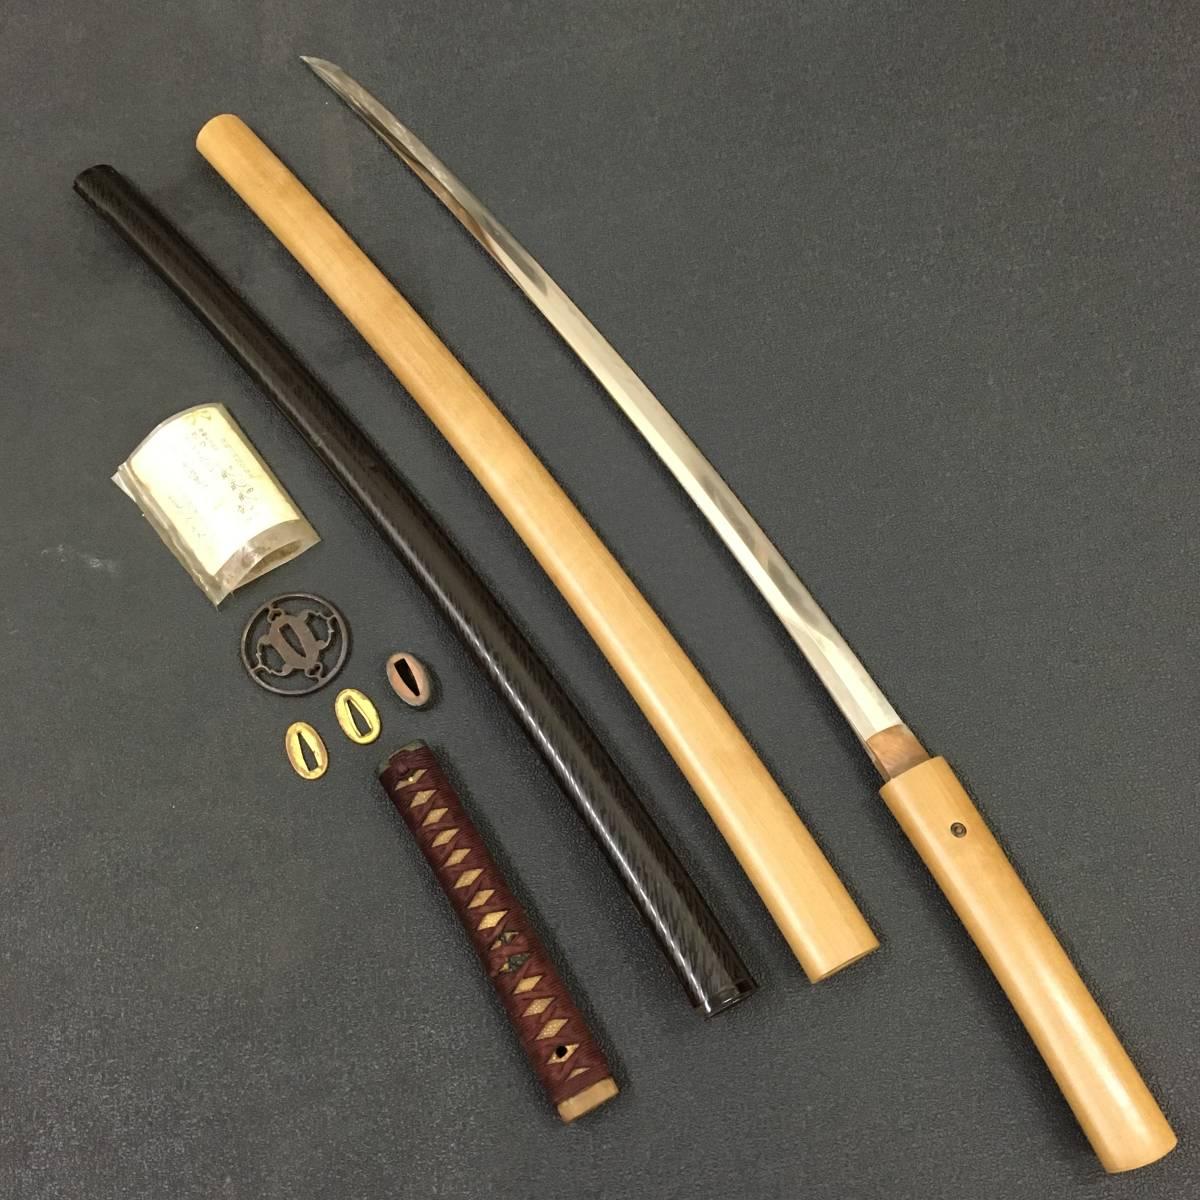 B【Apr97】 左近是一銘 日本刀 刃渡り68.78㎝ 刀身約91.5㎝ 登録証付 太刀 刀剣